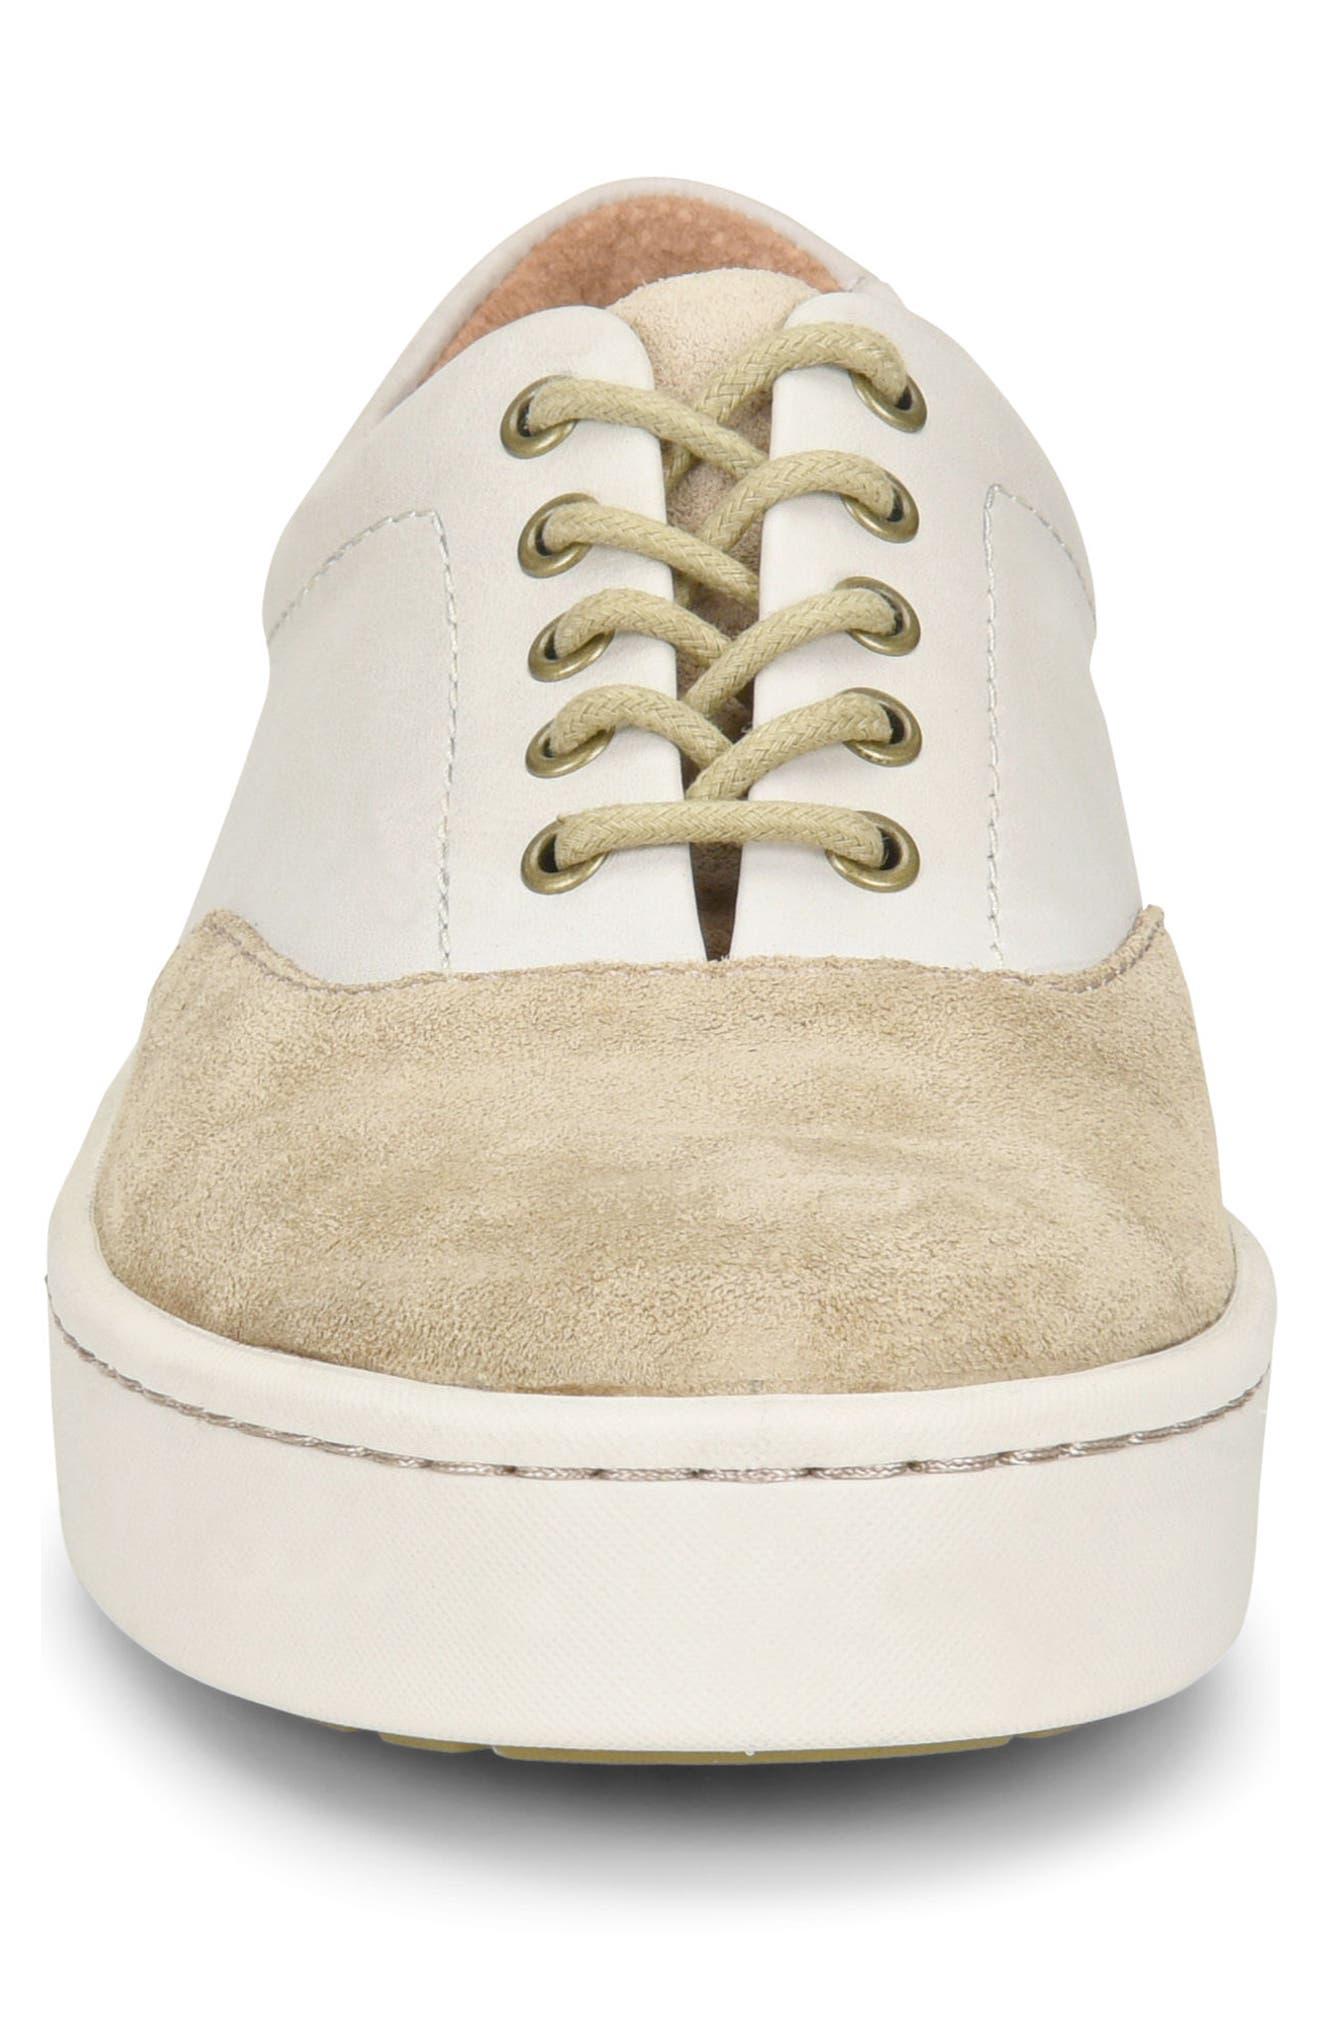 Keystone Low Top Sneaker,                             Alternate thumbnail 12, color,